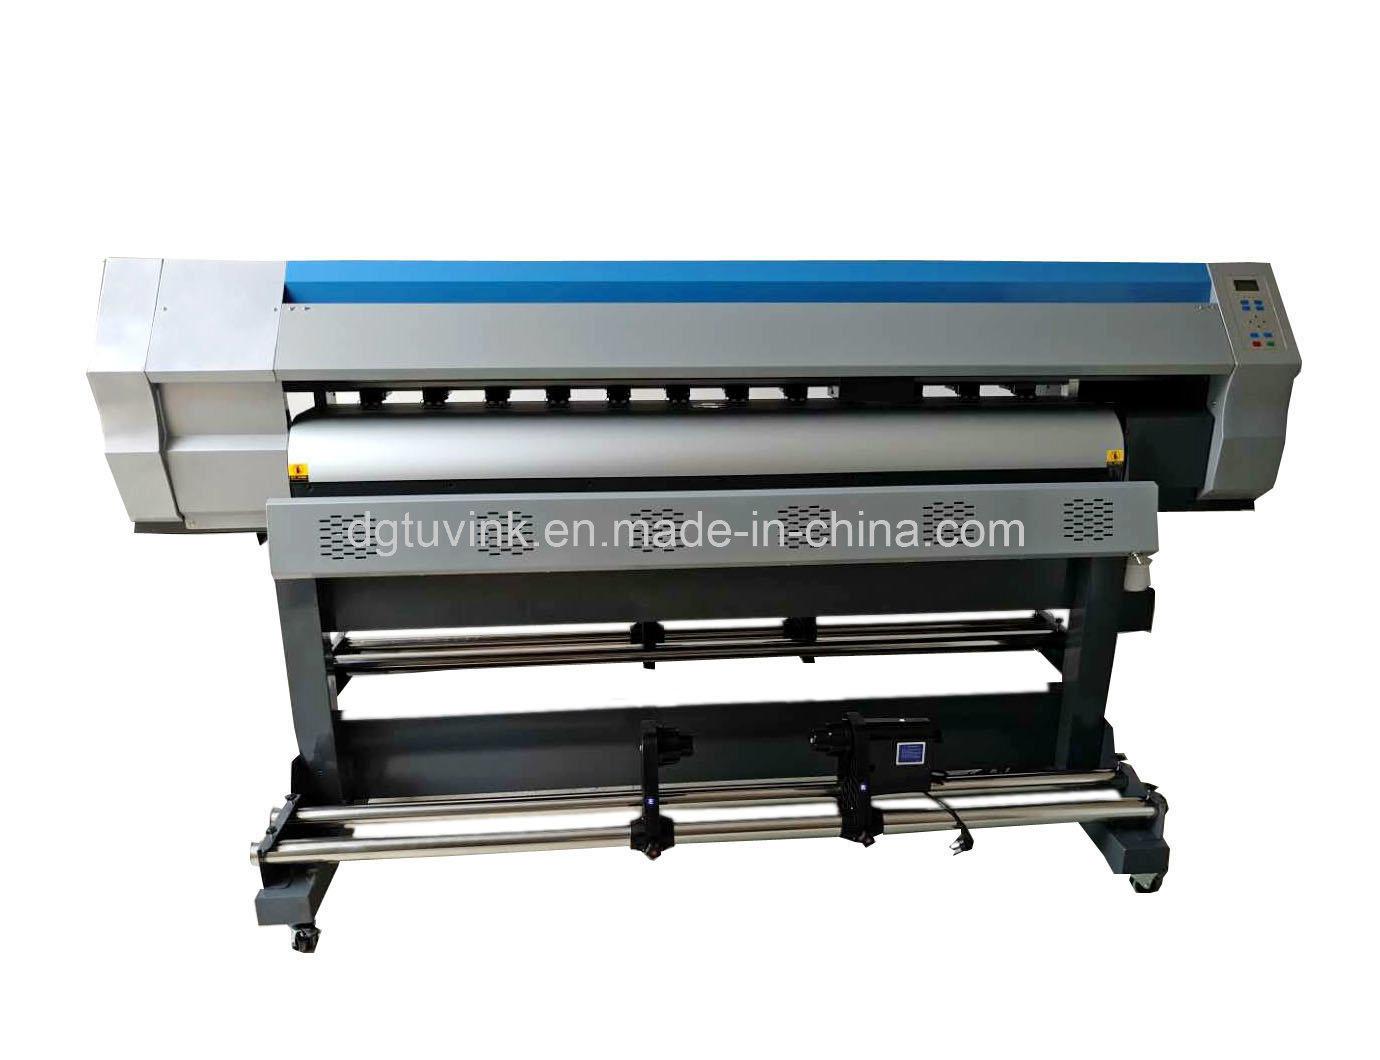 China 1 6m vinyl sticker film digital inkjet printer china digital inkjet printer large format printer